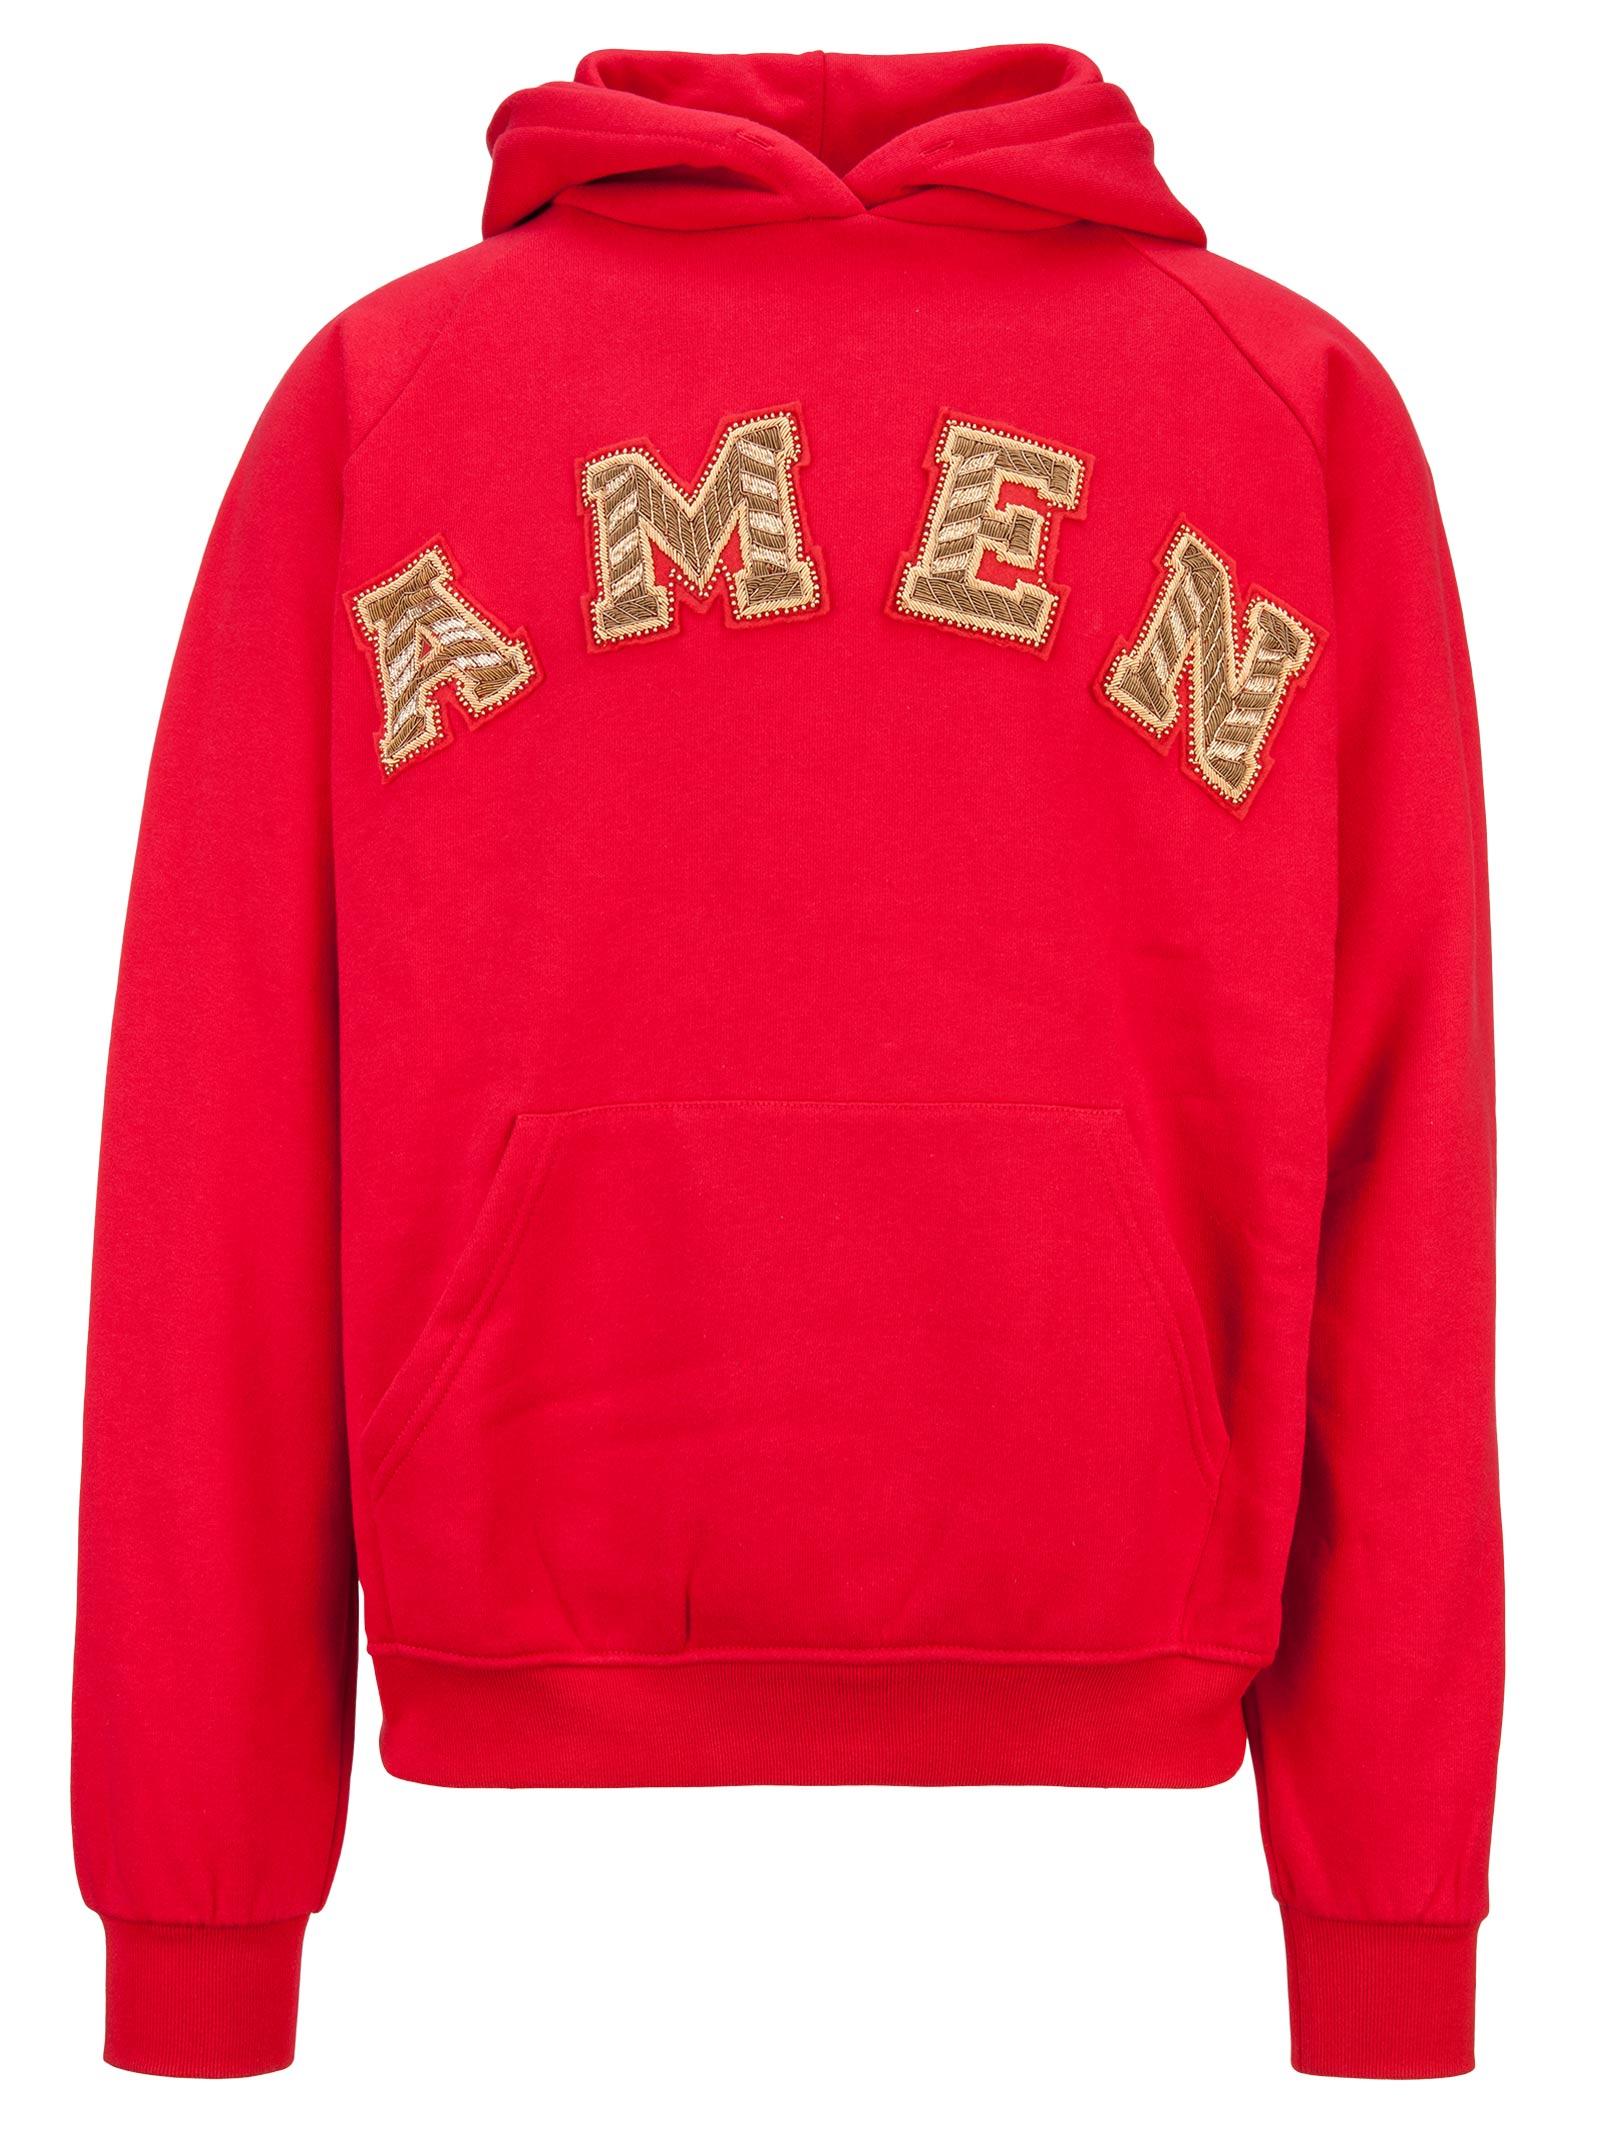 Amen sweatshirt